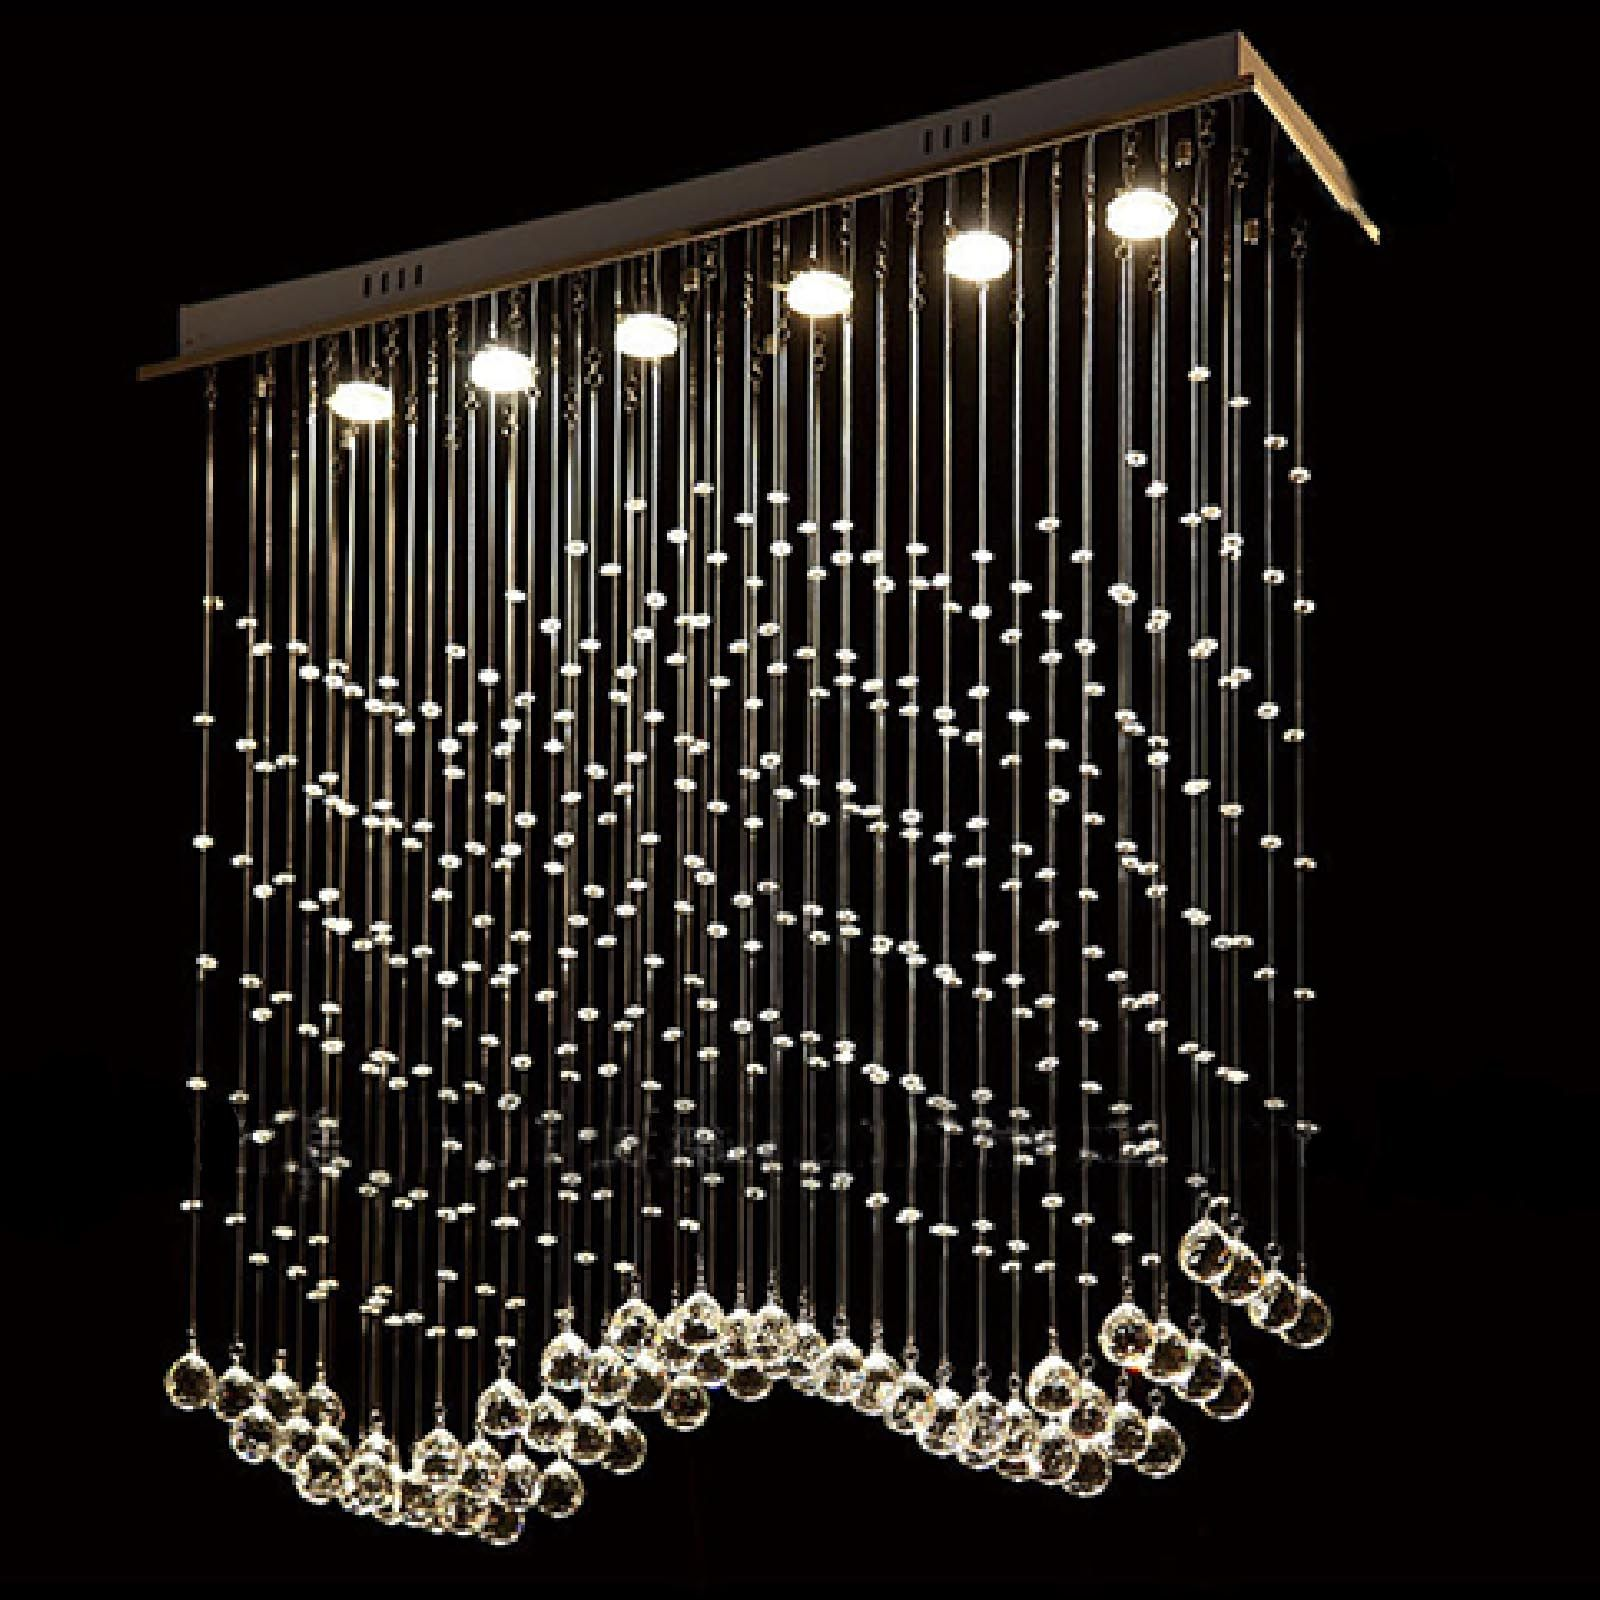 Byb new wave raindrop crystal chandelier rain drop design led byb new wave raindrop crystal chandelier rain drop design led lighting h100w25 aloadofball Gallery